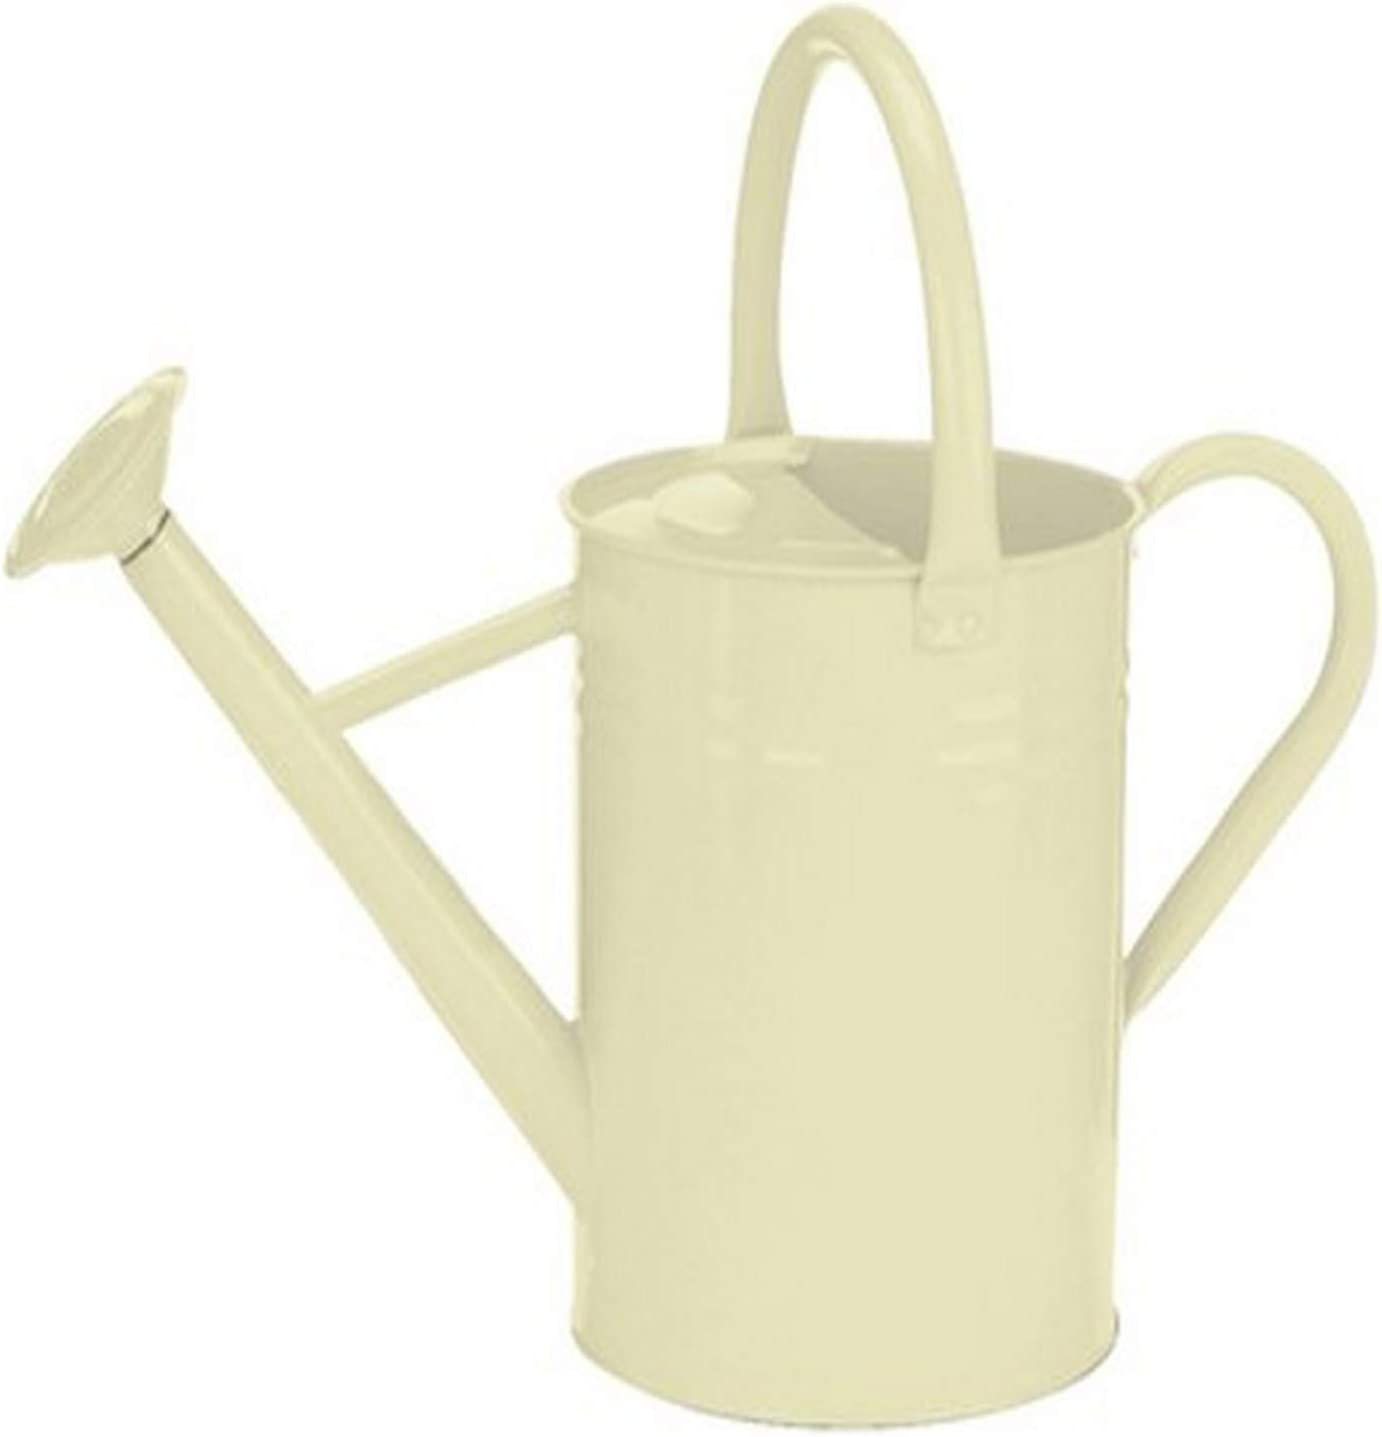 Gardman 8334 Galvanized Steel Watering Can, Cream, 1-Gallon